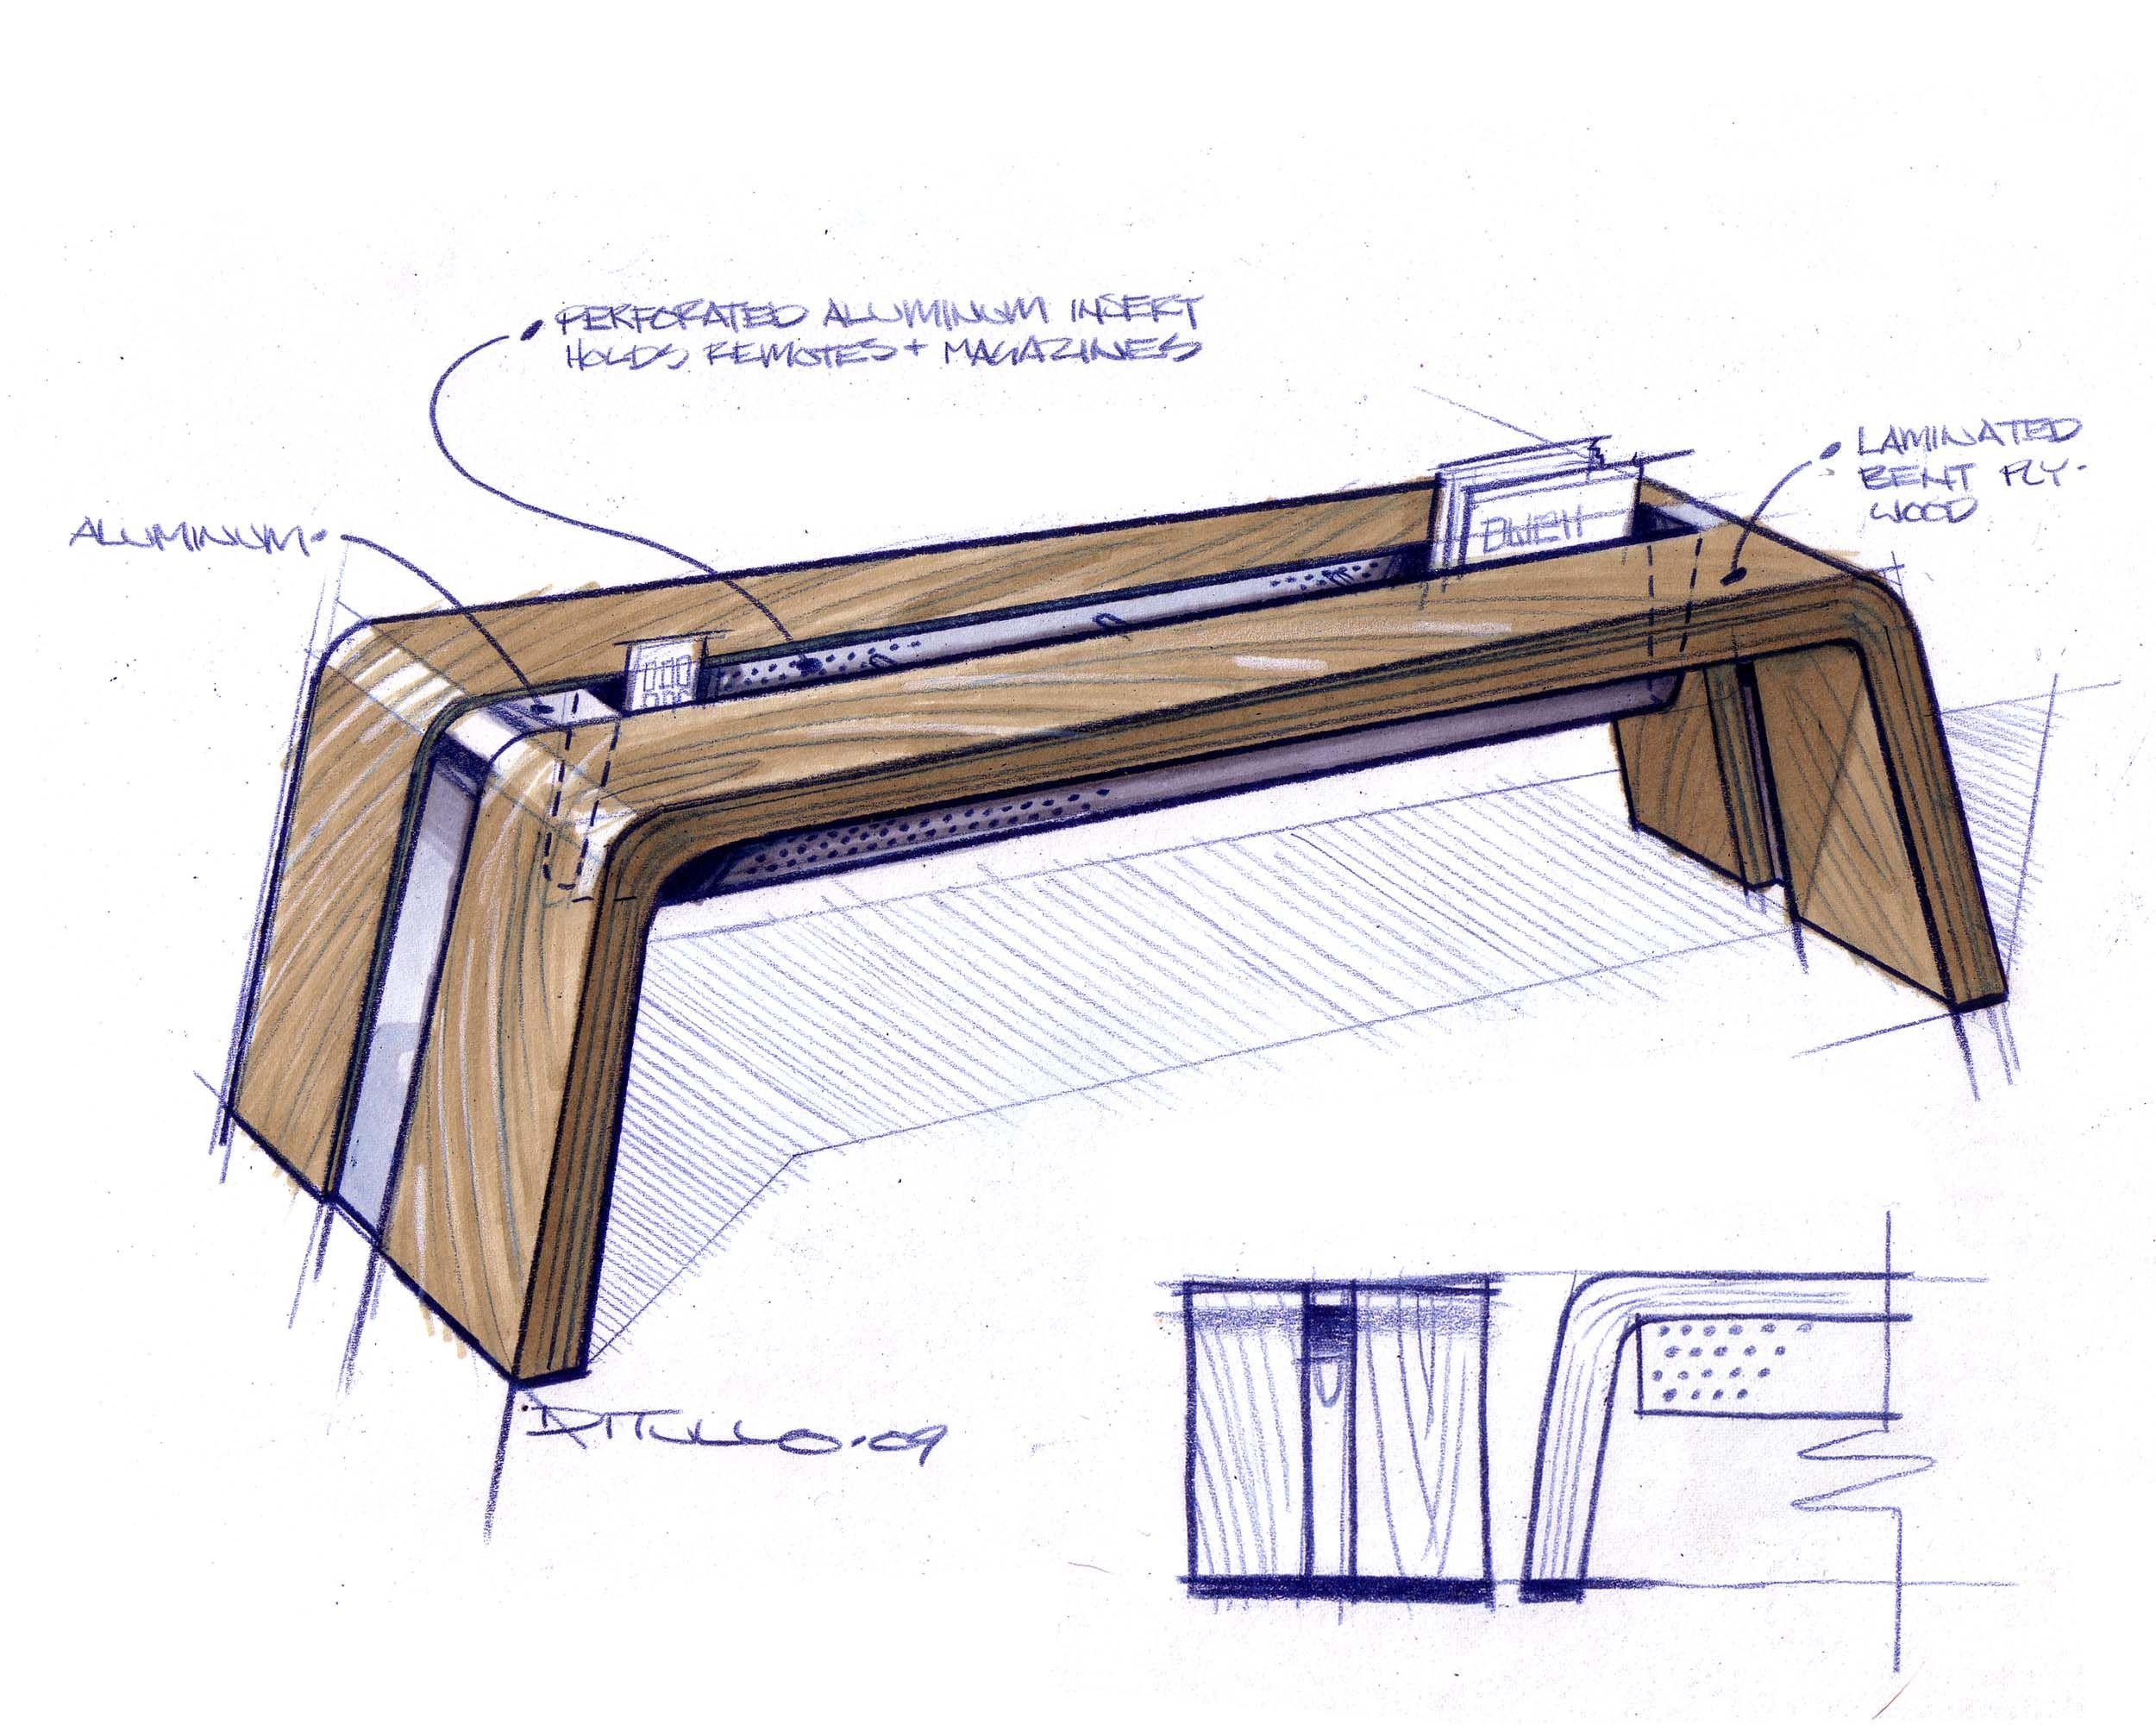 Ordinaire Furniture By Michael DiTullo At Coroflot.com